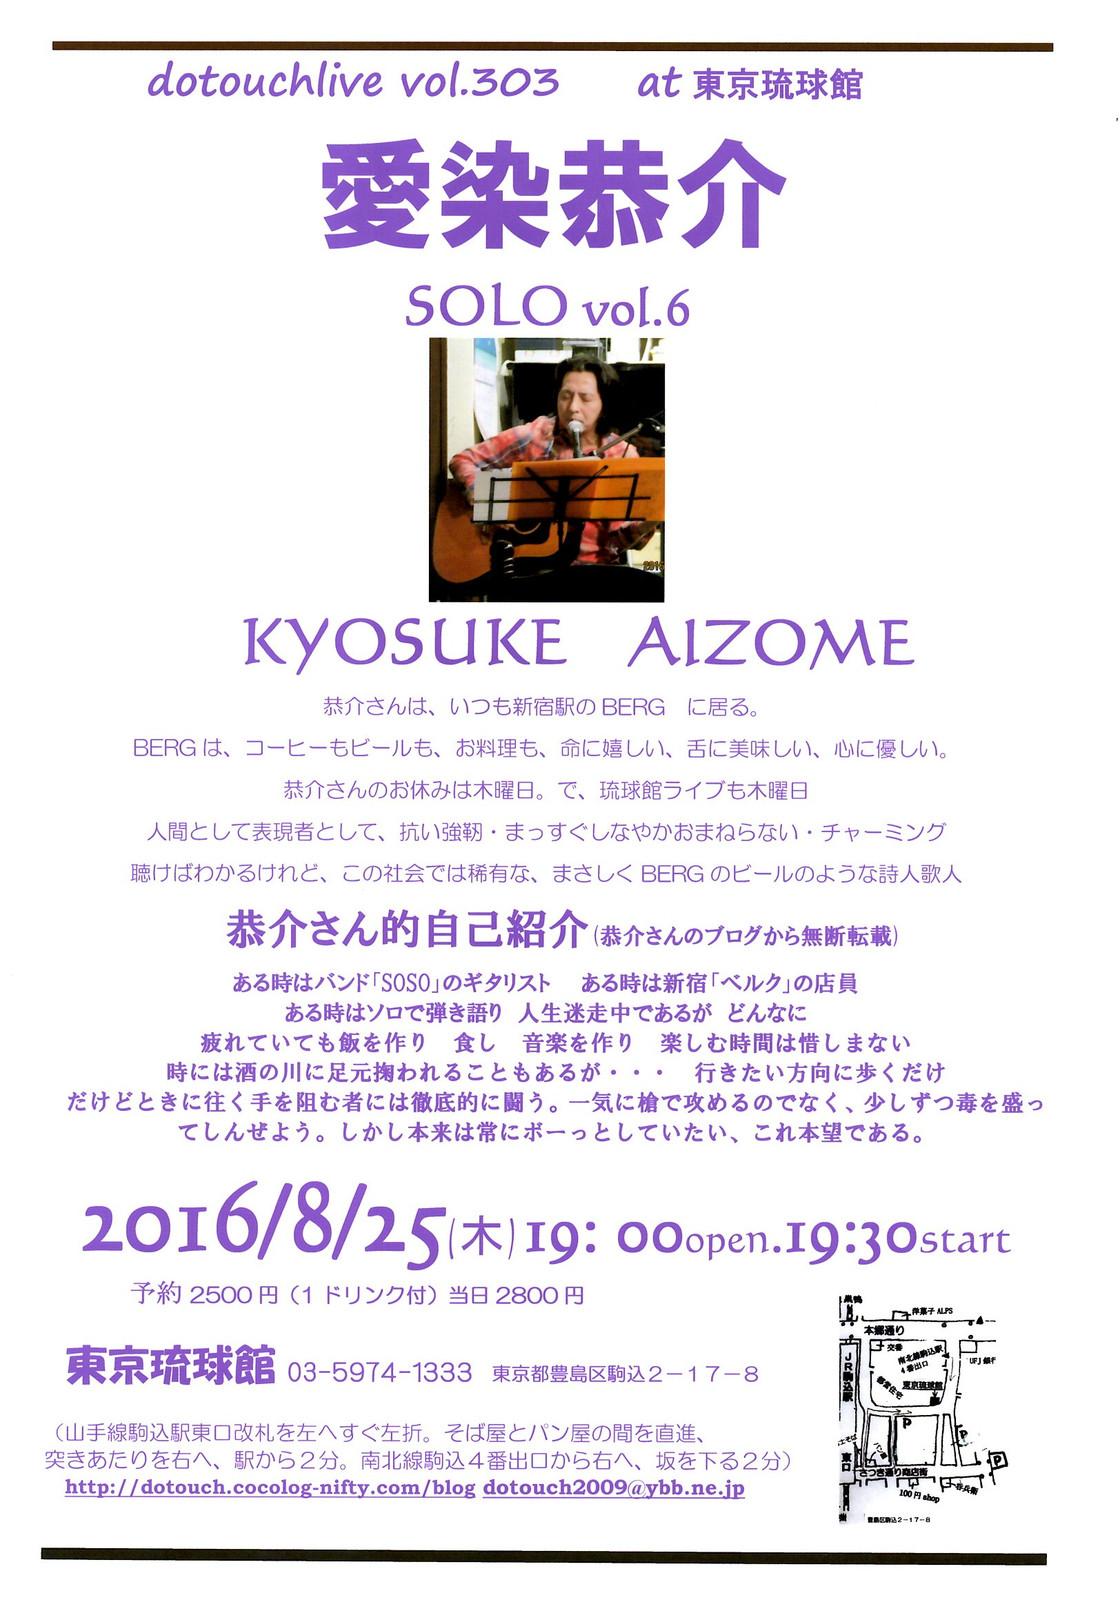 Kyosukezolo6